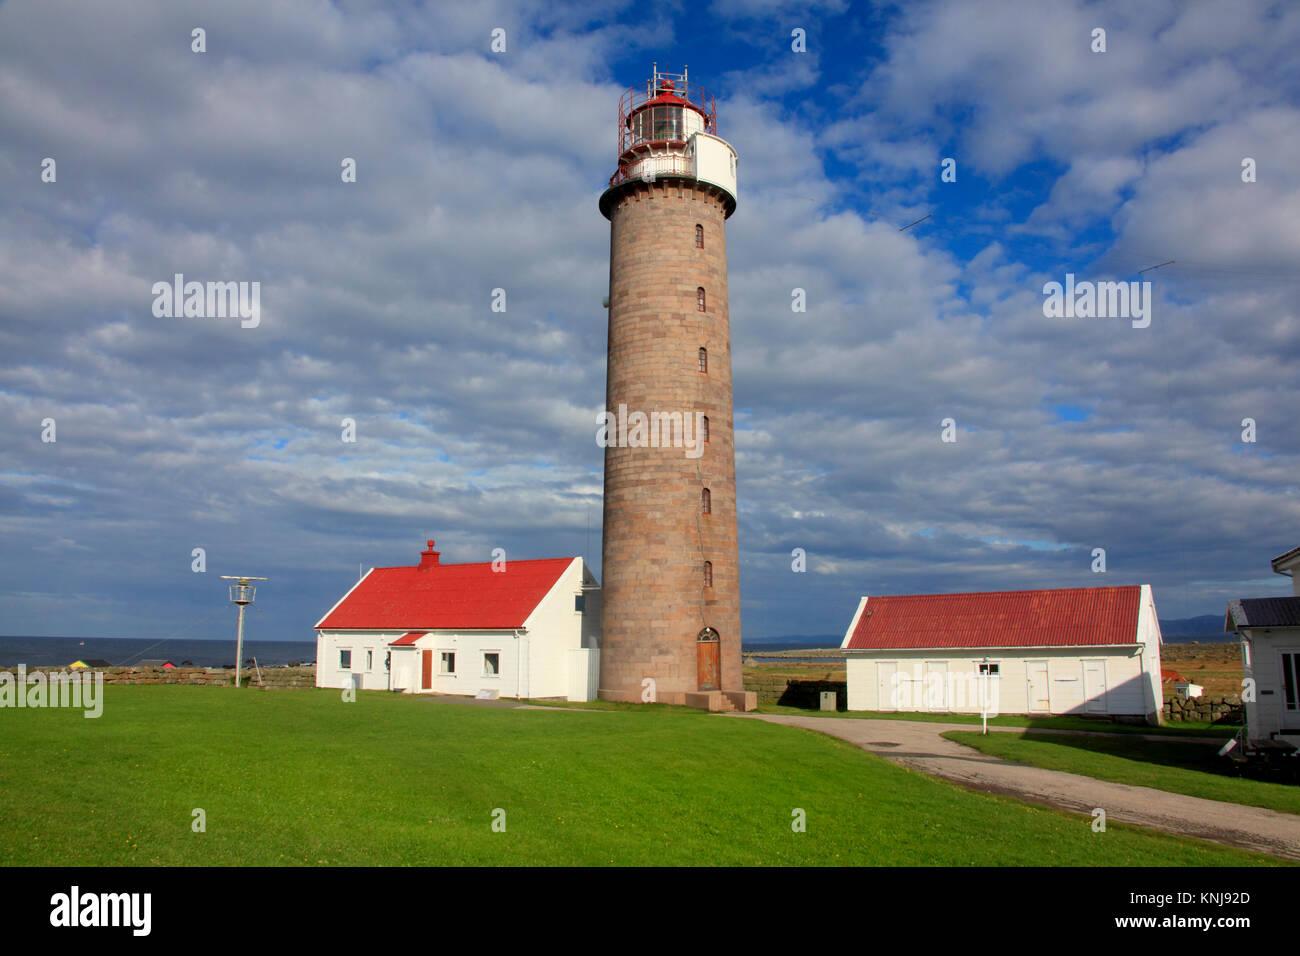 Lista Lighthouse, on the Lista Peninsula, village of Vestbygd, Farsund munincipality, Norway - Stock Image